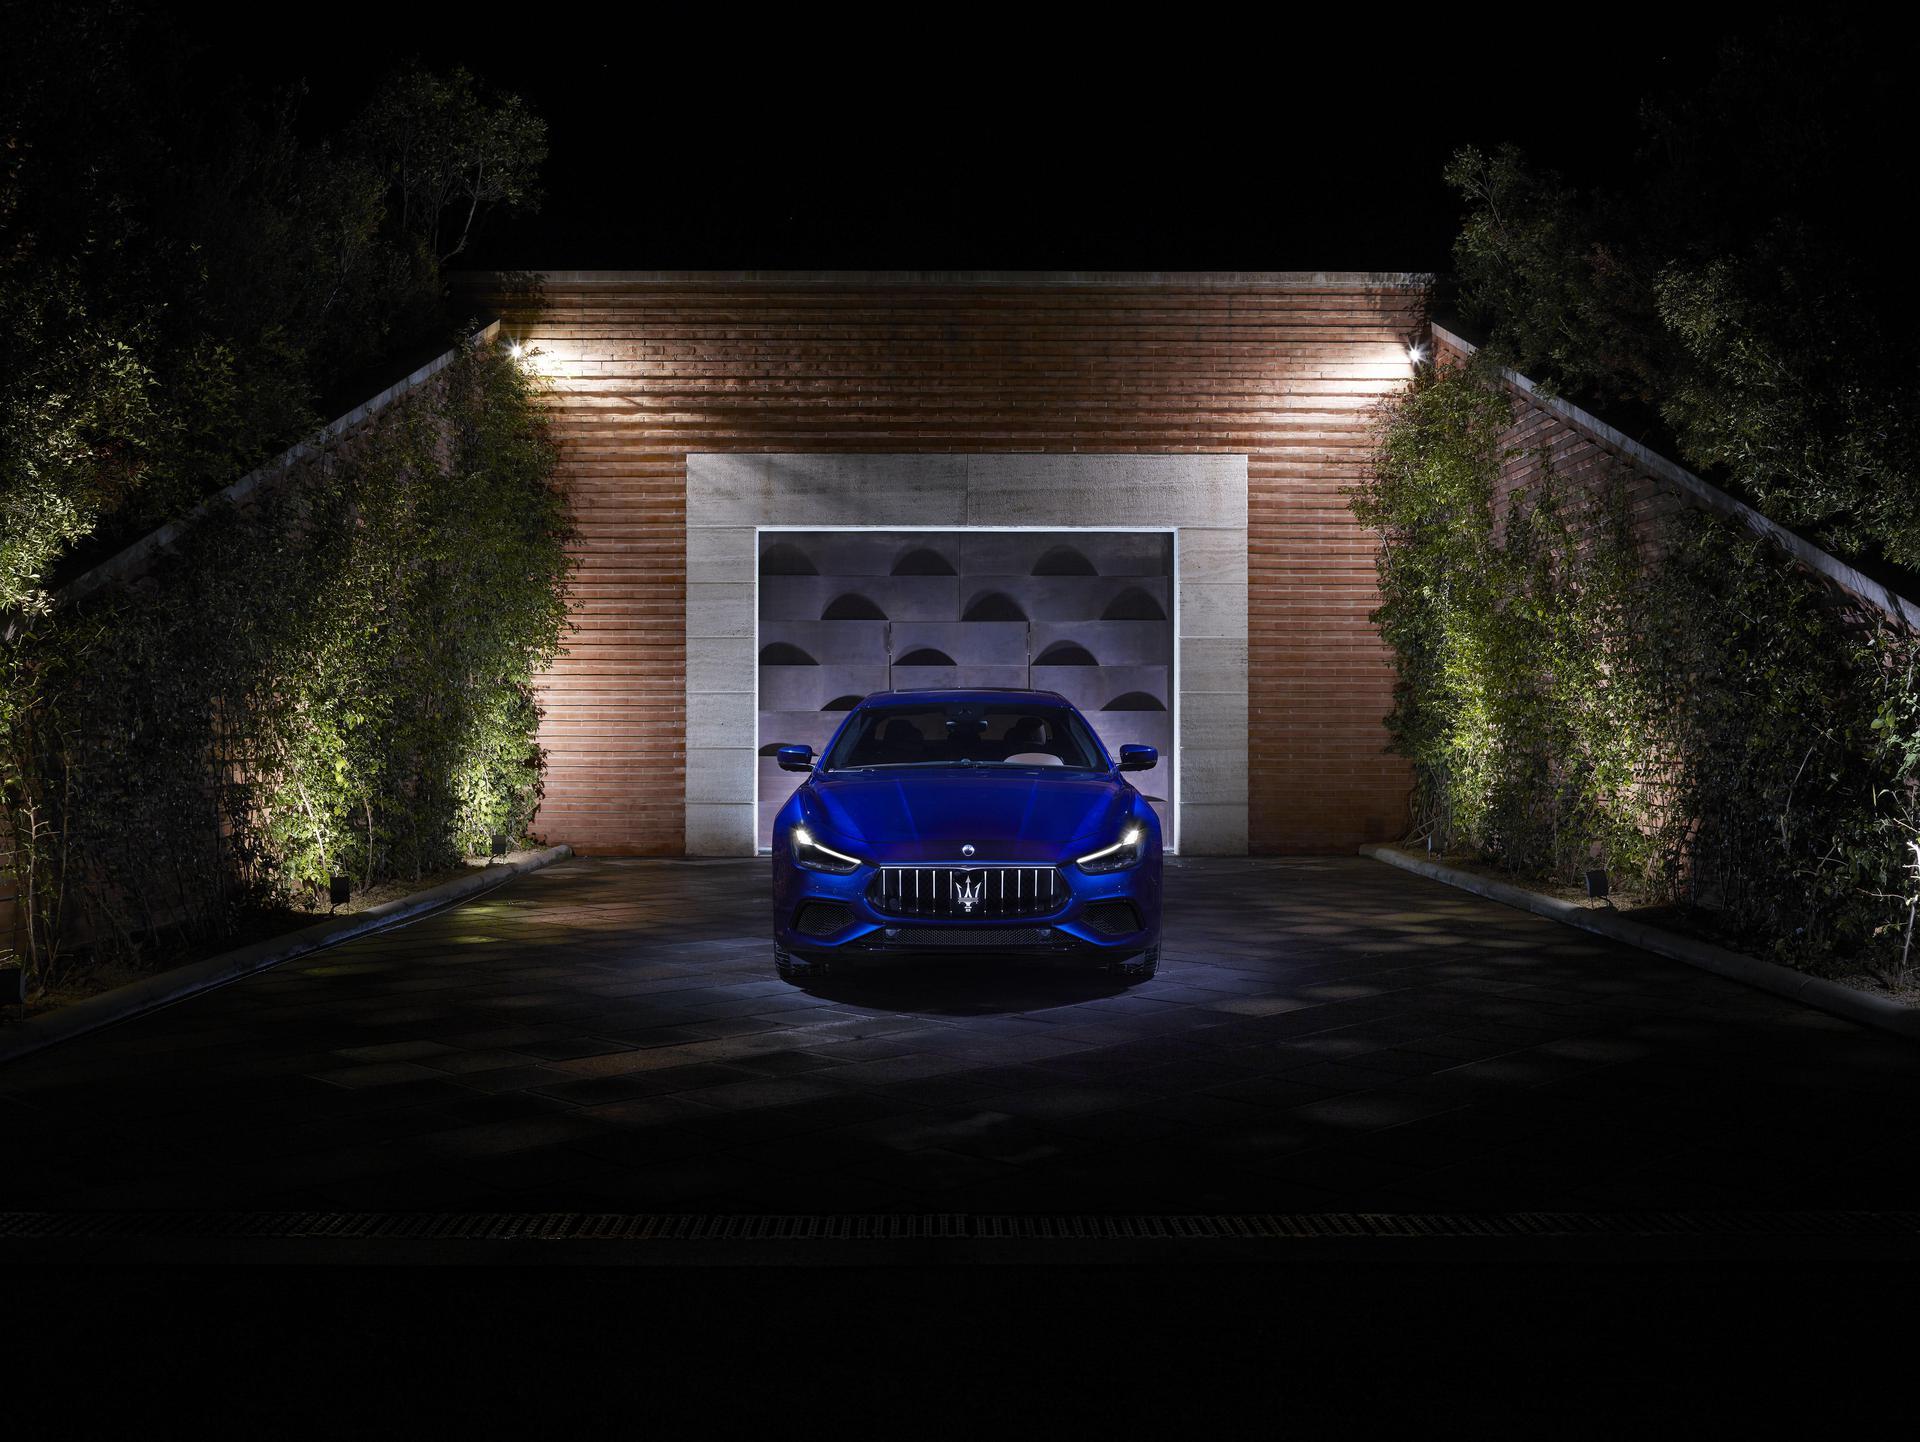 Maserati kondigt samenwerking aan met wijnmaker Antinori